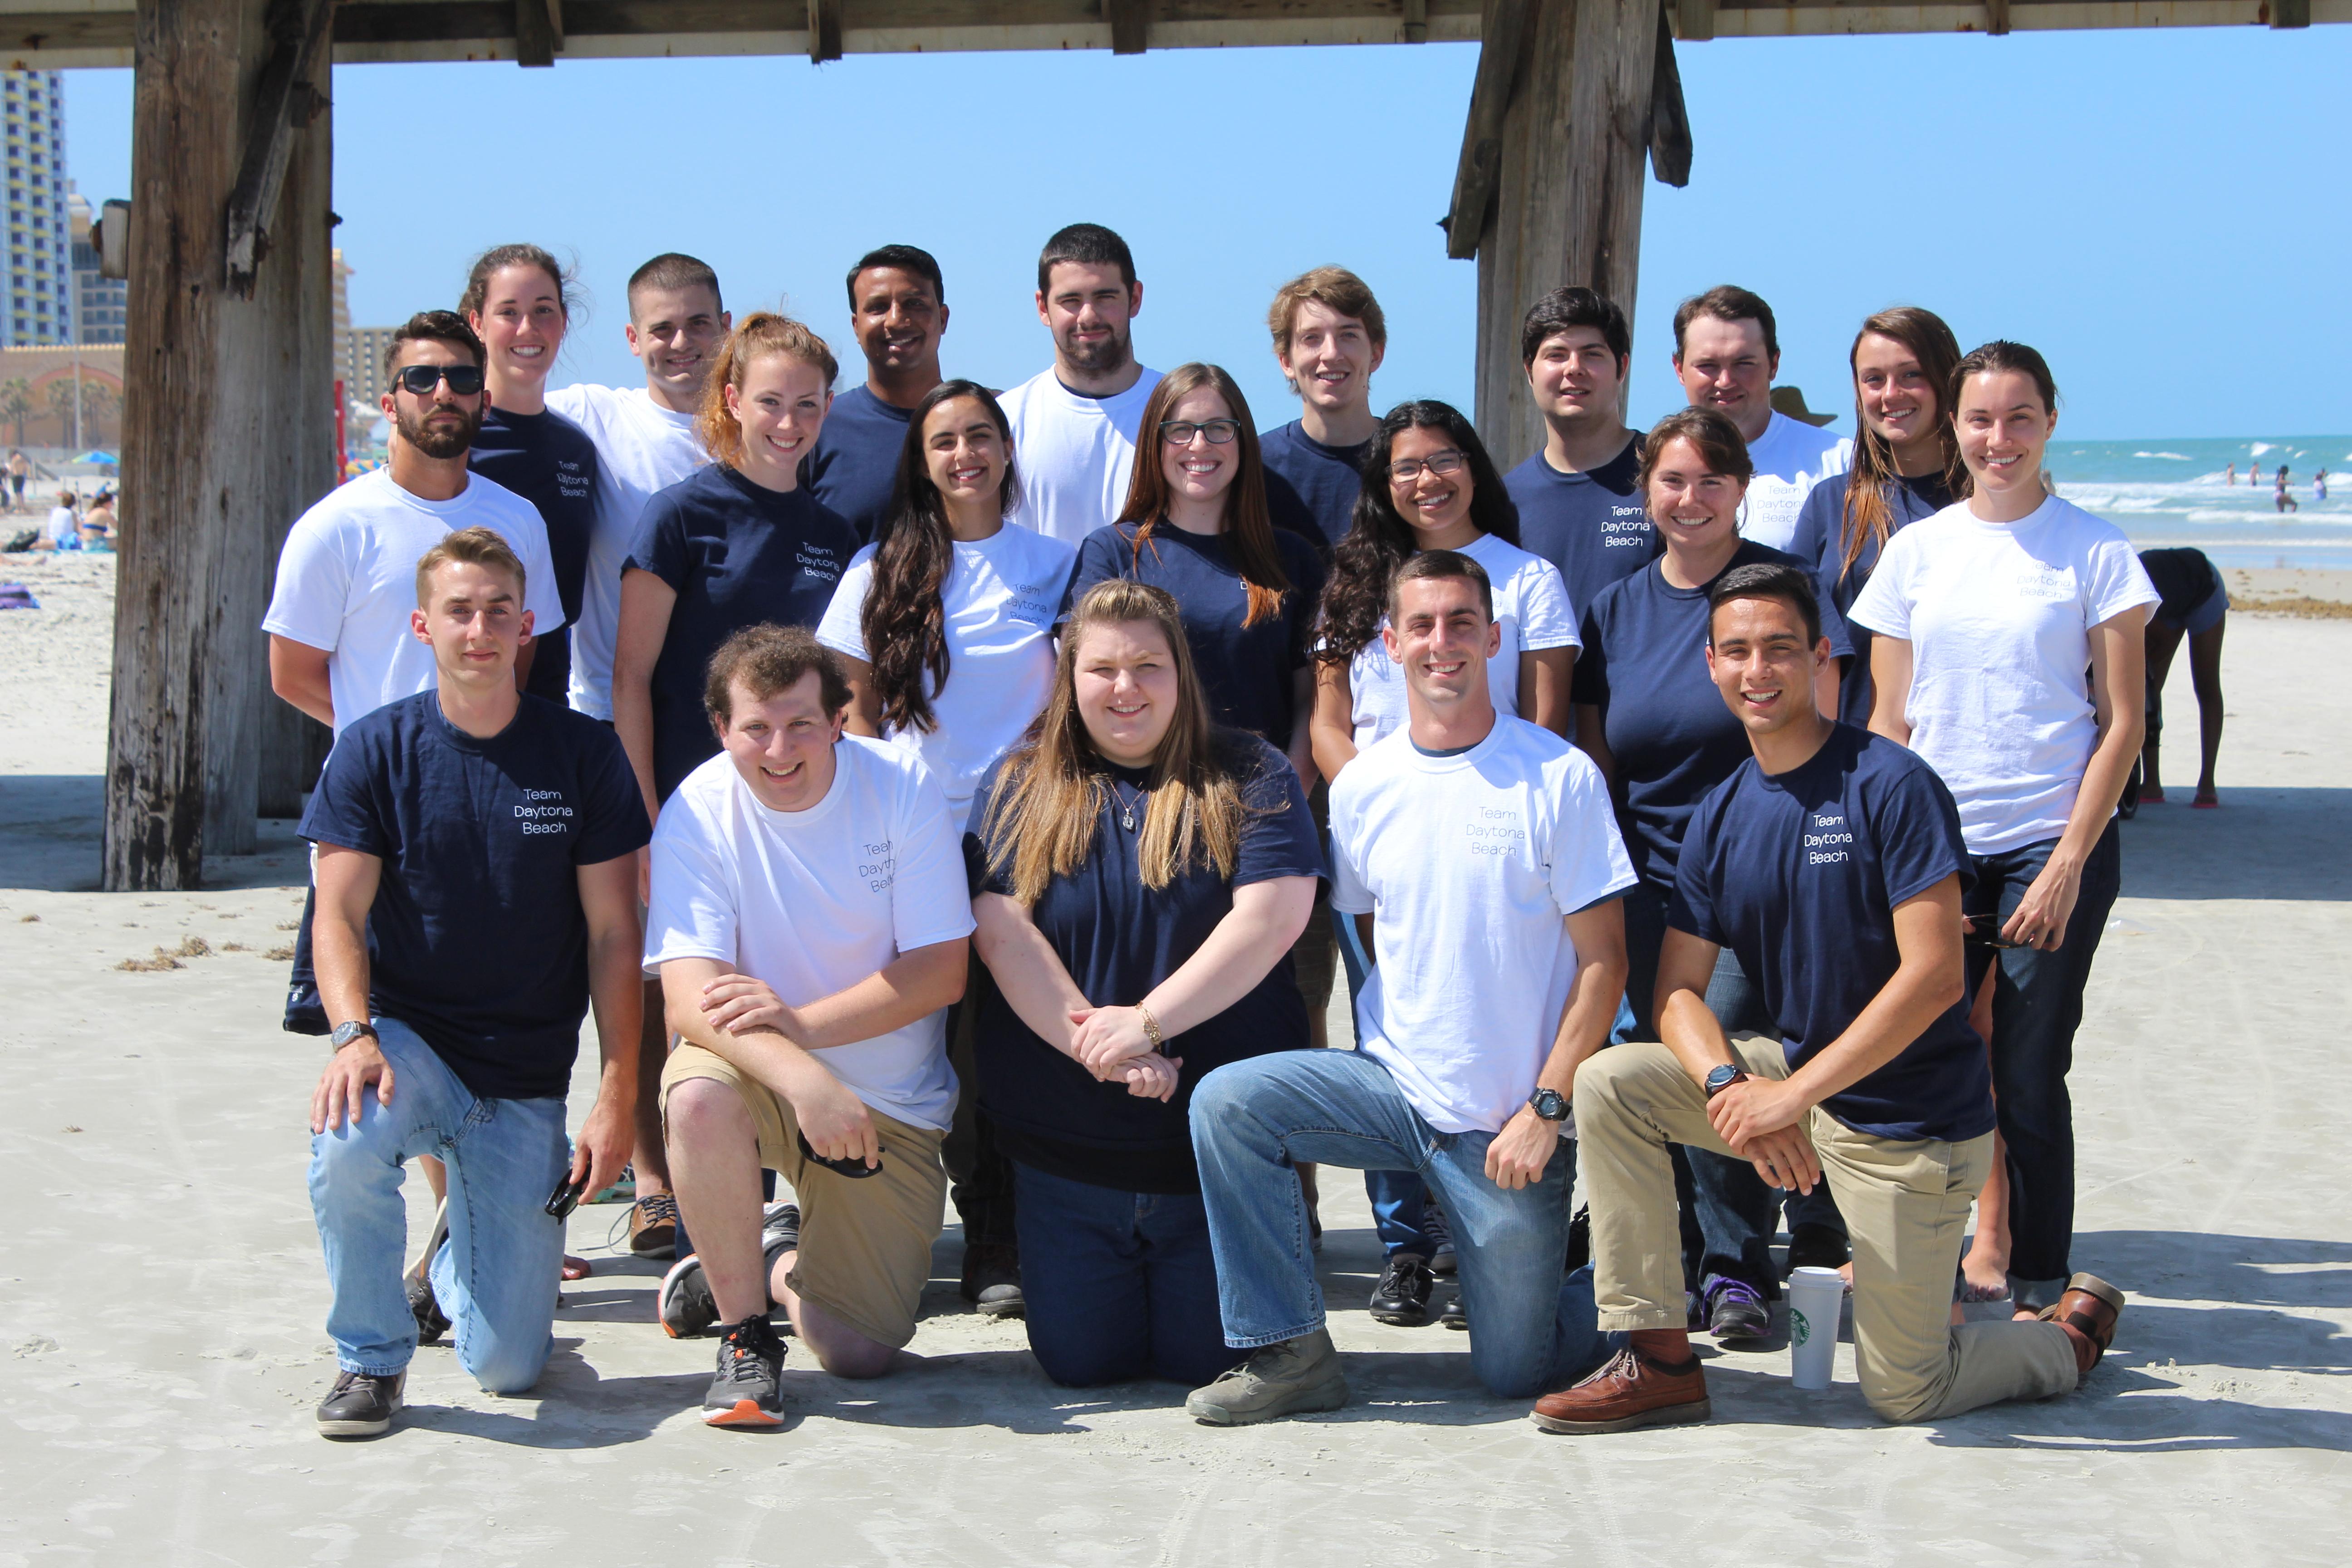 Group Photo Of The Daytona Beach Team Members Solar Decathlon 2017